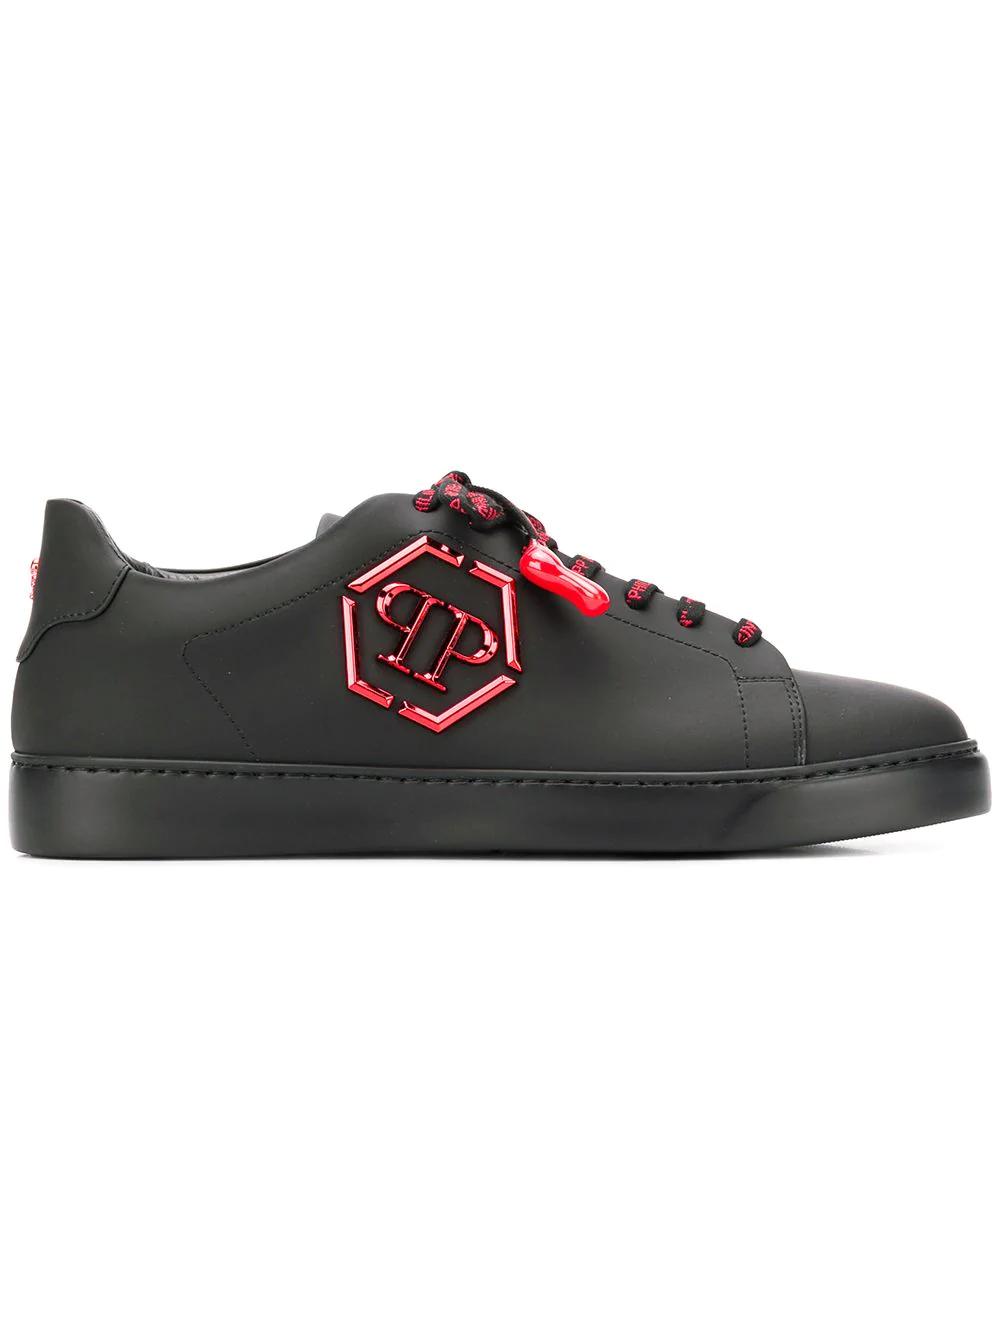 a312336d94 Philipp Plein Logo Plaque Sneakers - Black | ModeSens